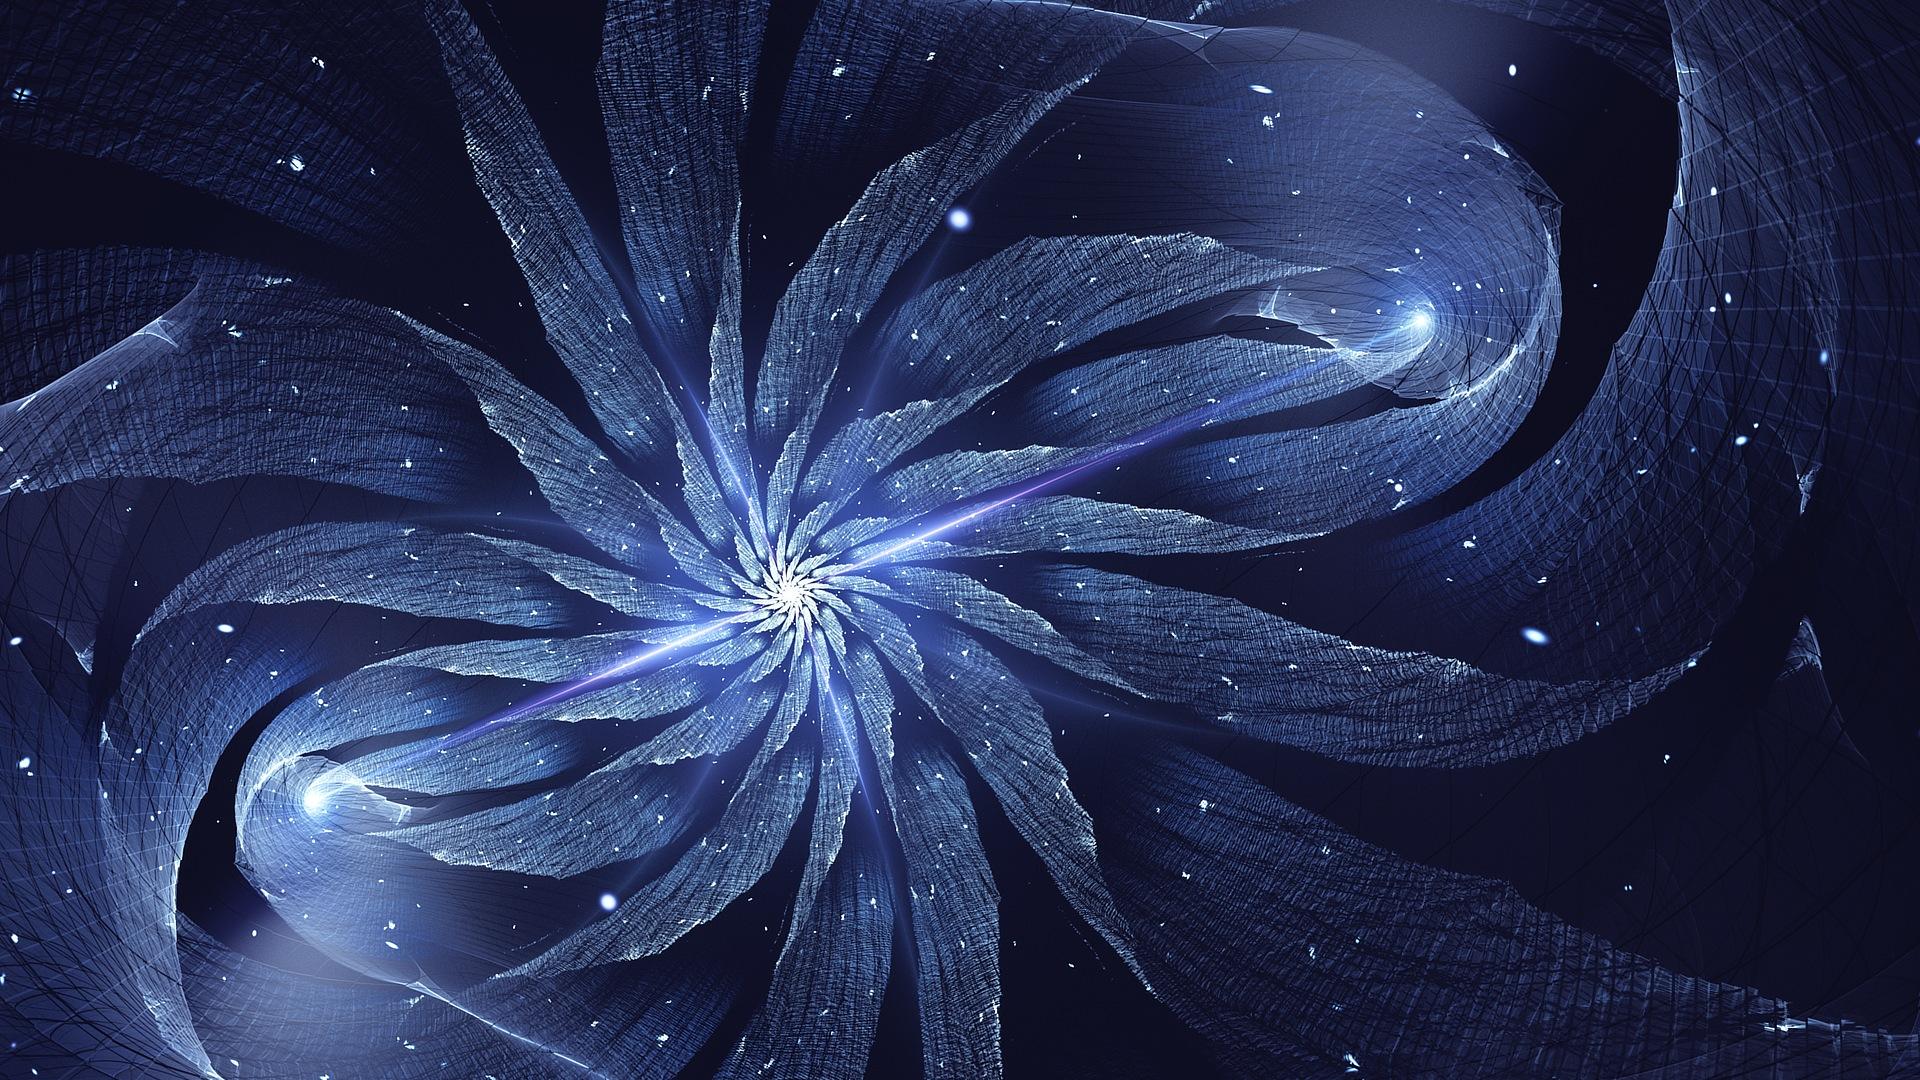 Wallpaper Abstract Flower Fractal Rotation 1920x1080